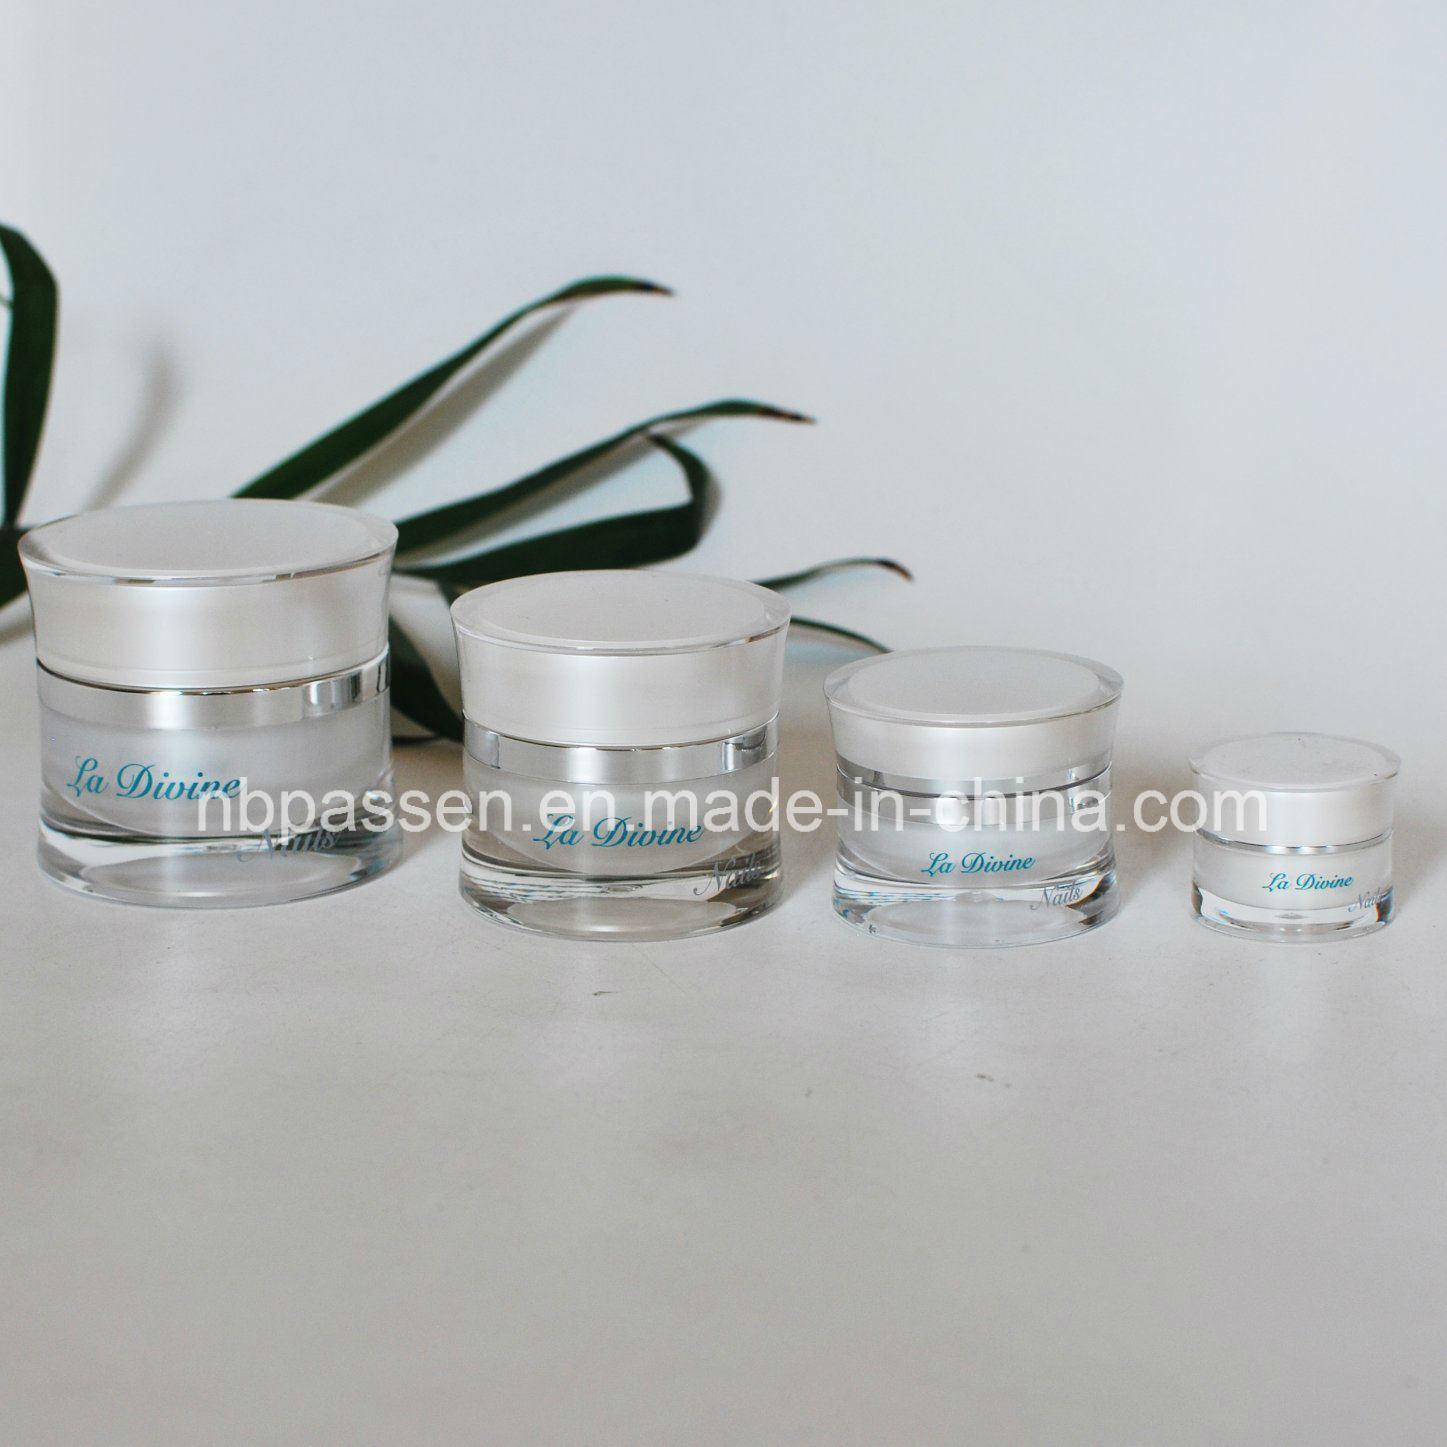 New 5/15/30/50g Pearl White Acrylic Waist Cream Jar for Cosmetics (PPC-NEW-113)